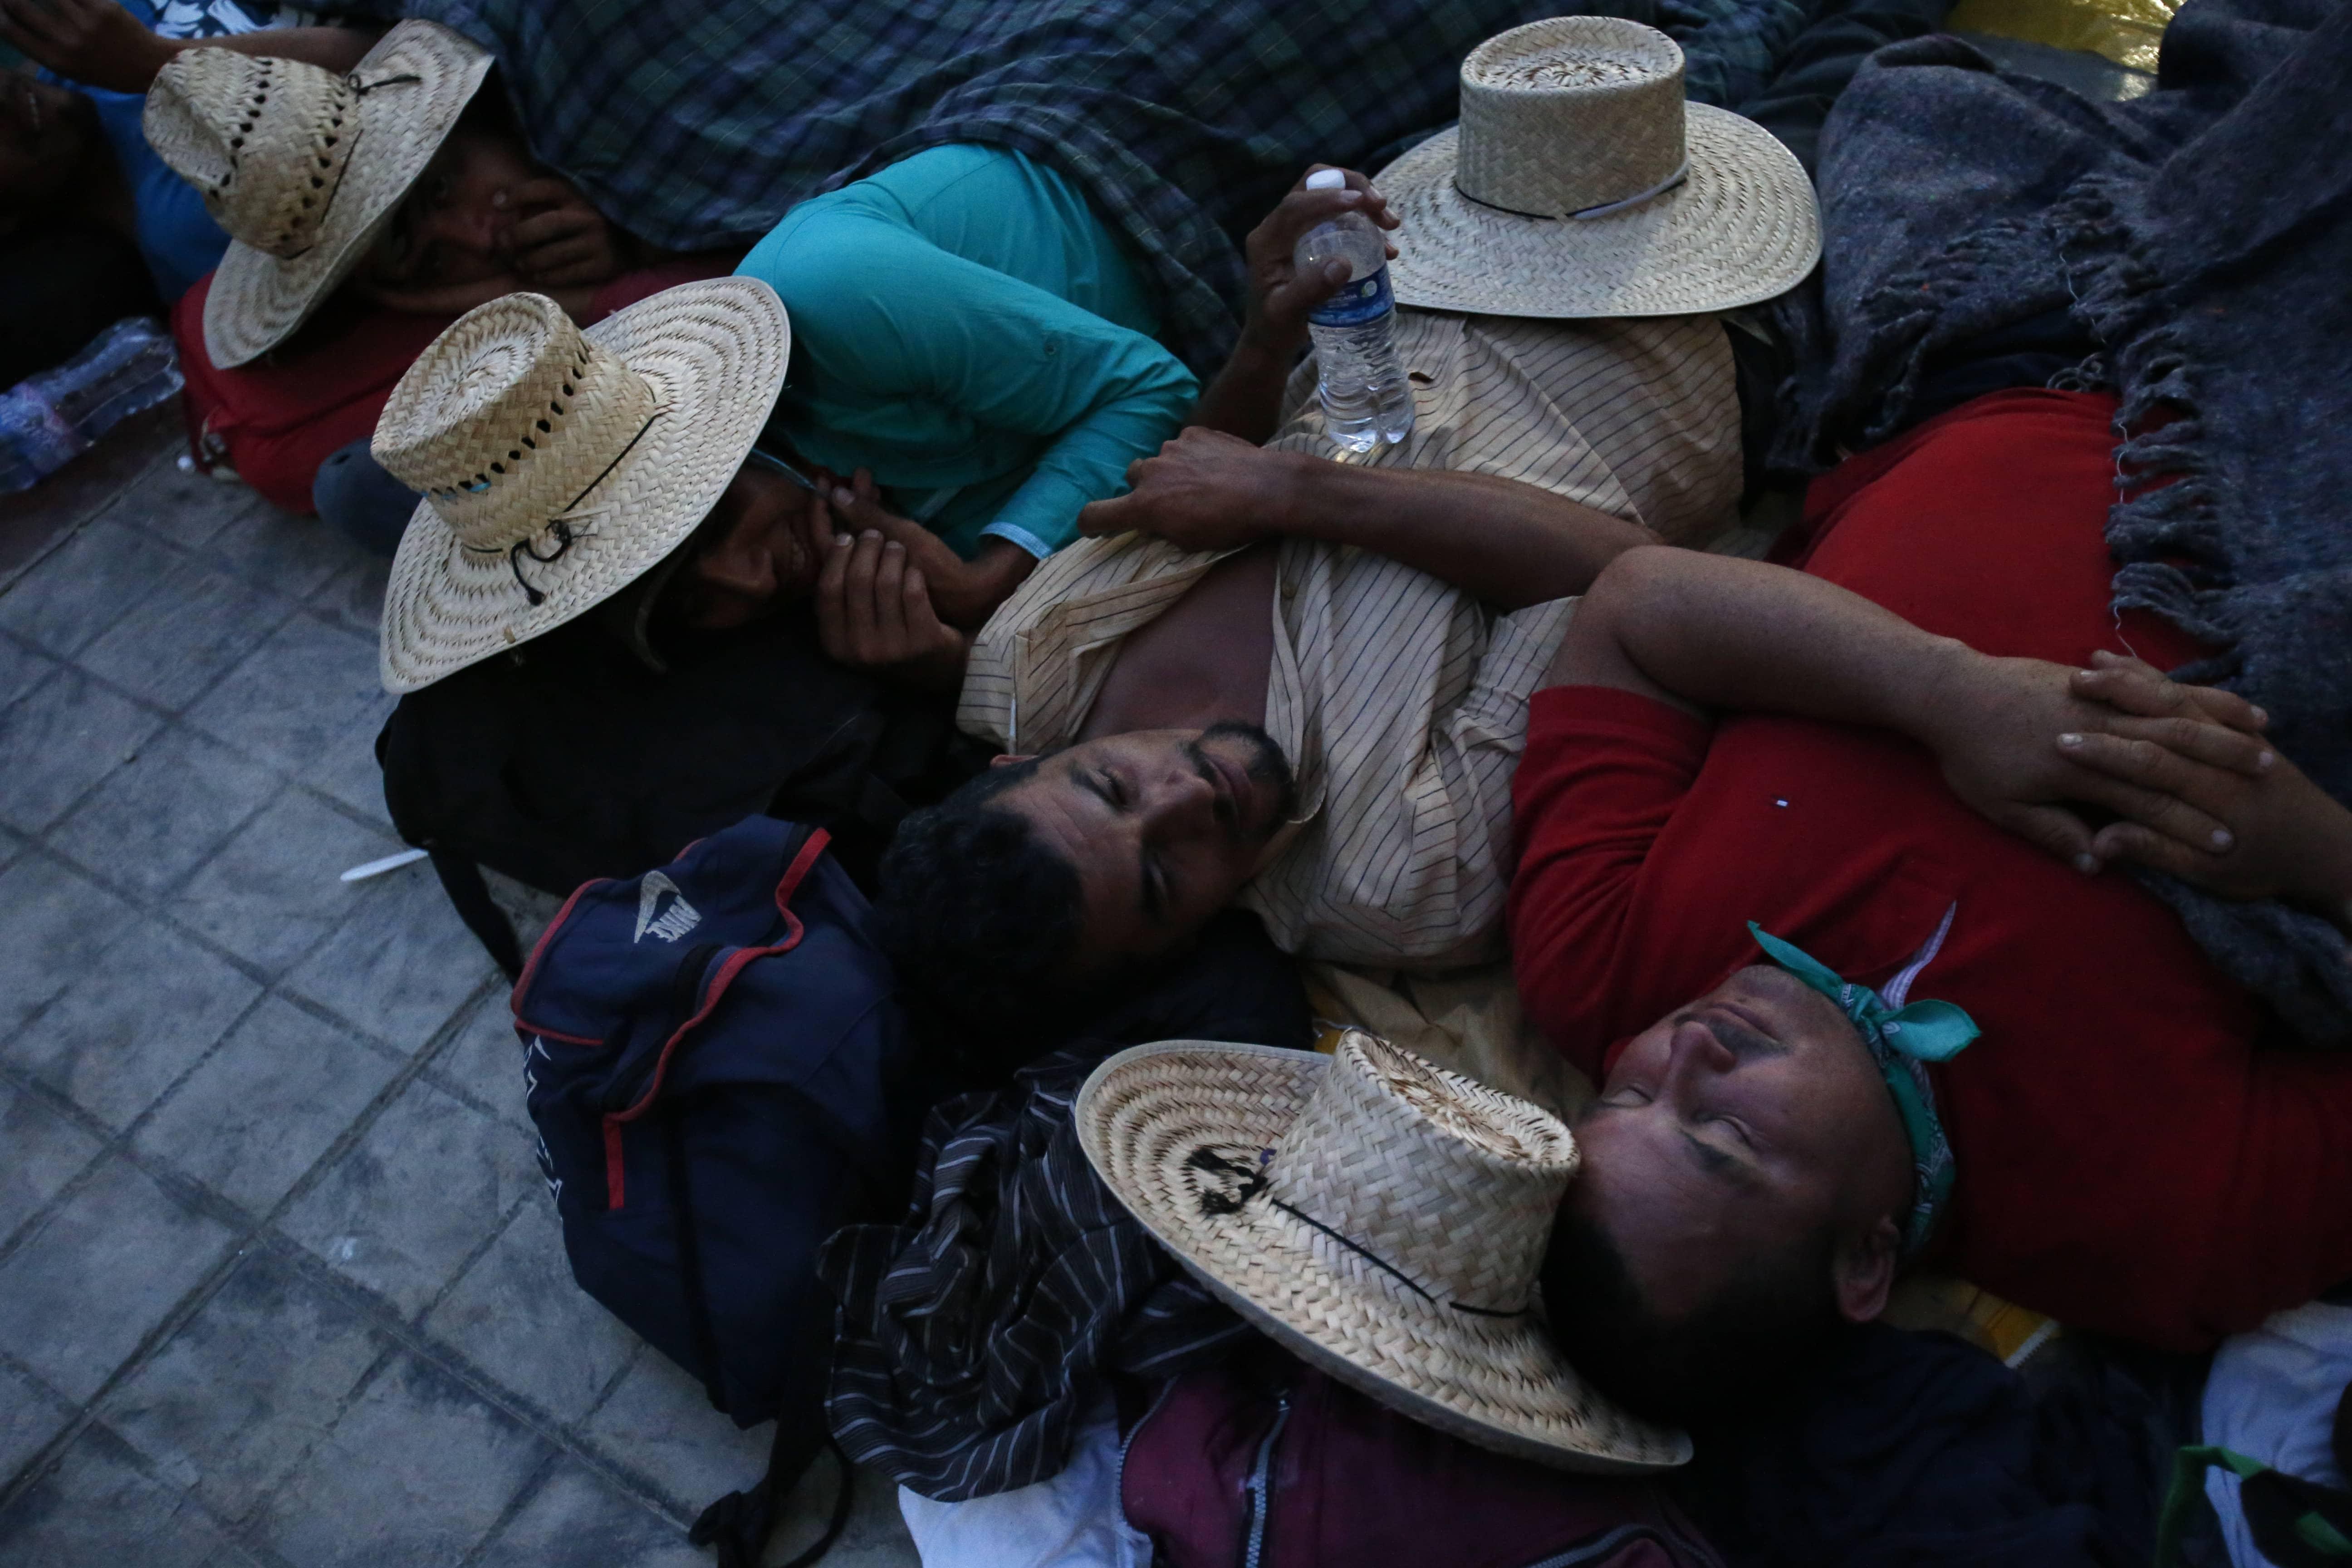 Photo of migrants sleeping in a church courtyard at nightfall